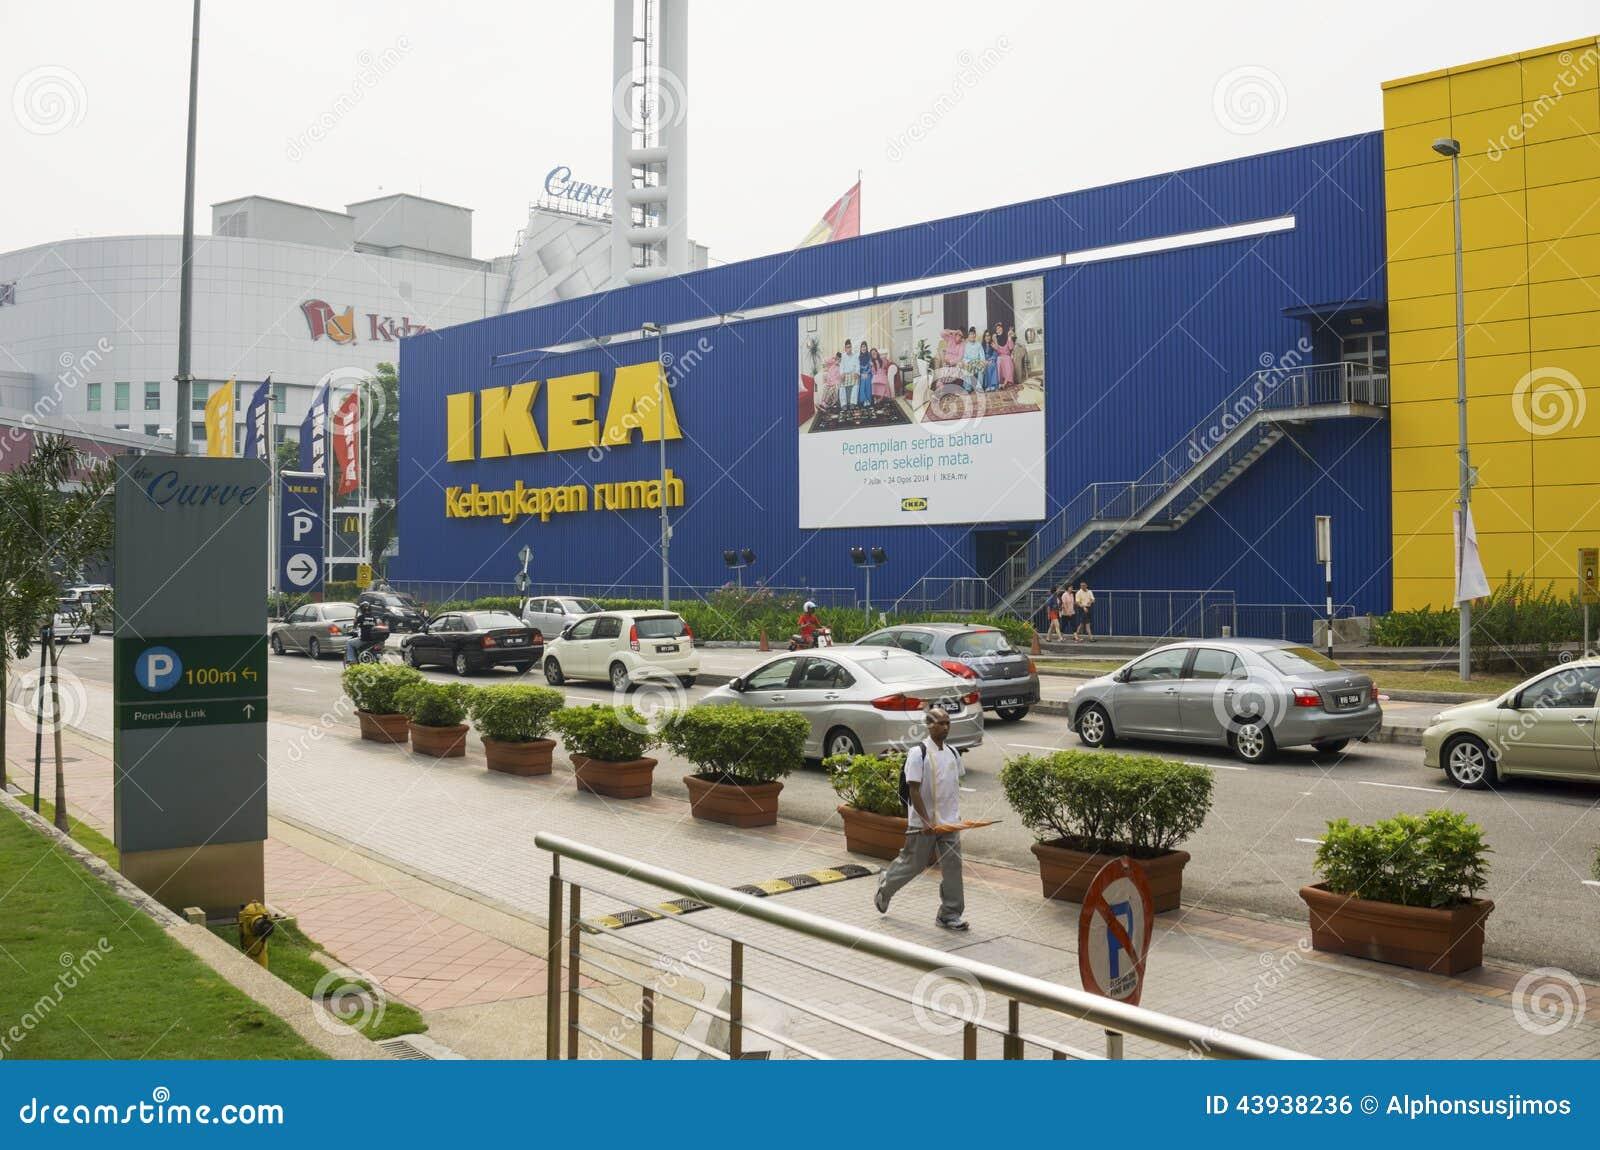 Ikea kuala lumpur store malaysia editorial photo image for Affordable furniture kuala lumpur